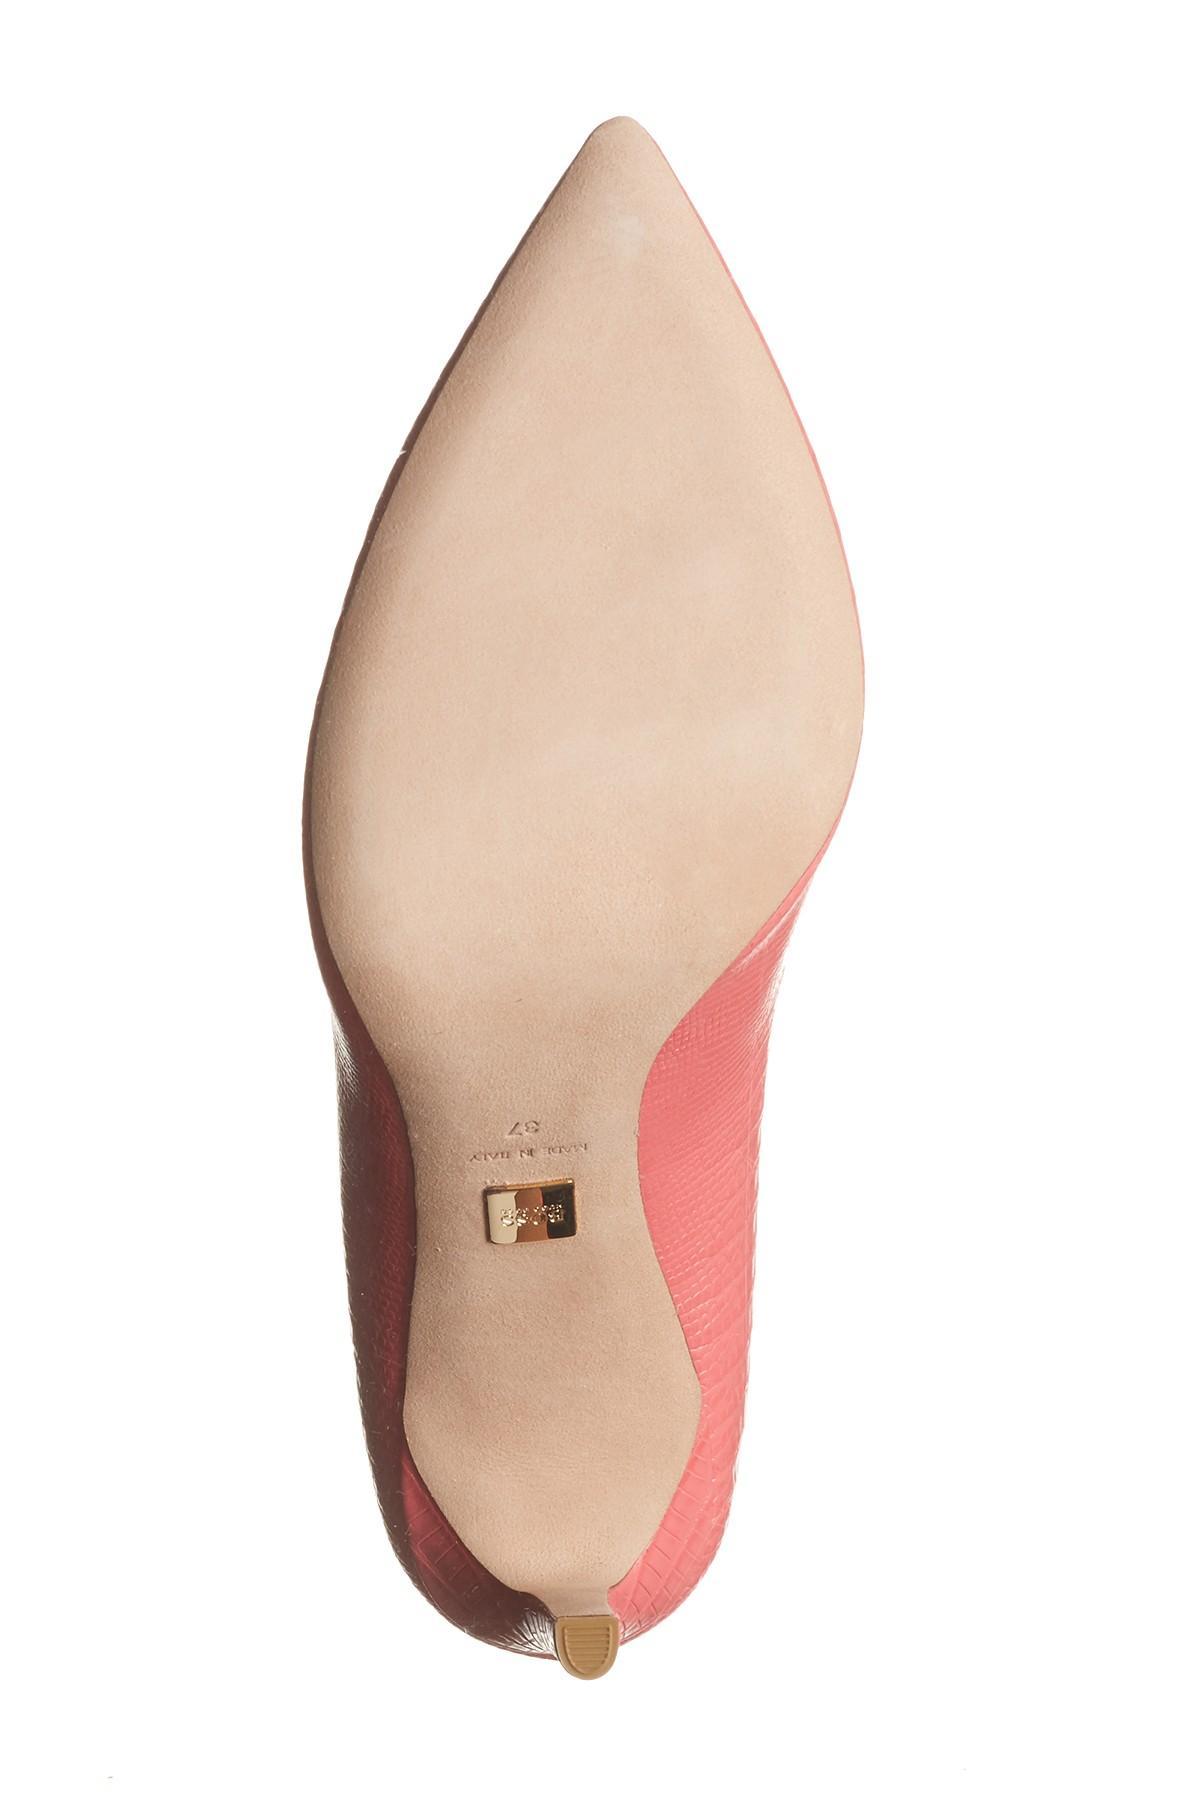 97618157fa3 BOSS Multicolor Staple Croc Emed Point Heel